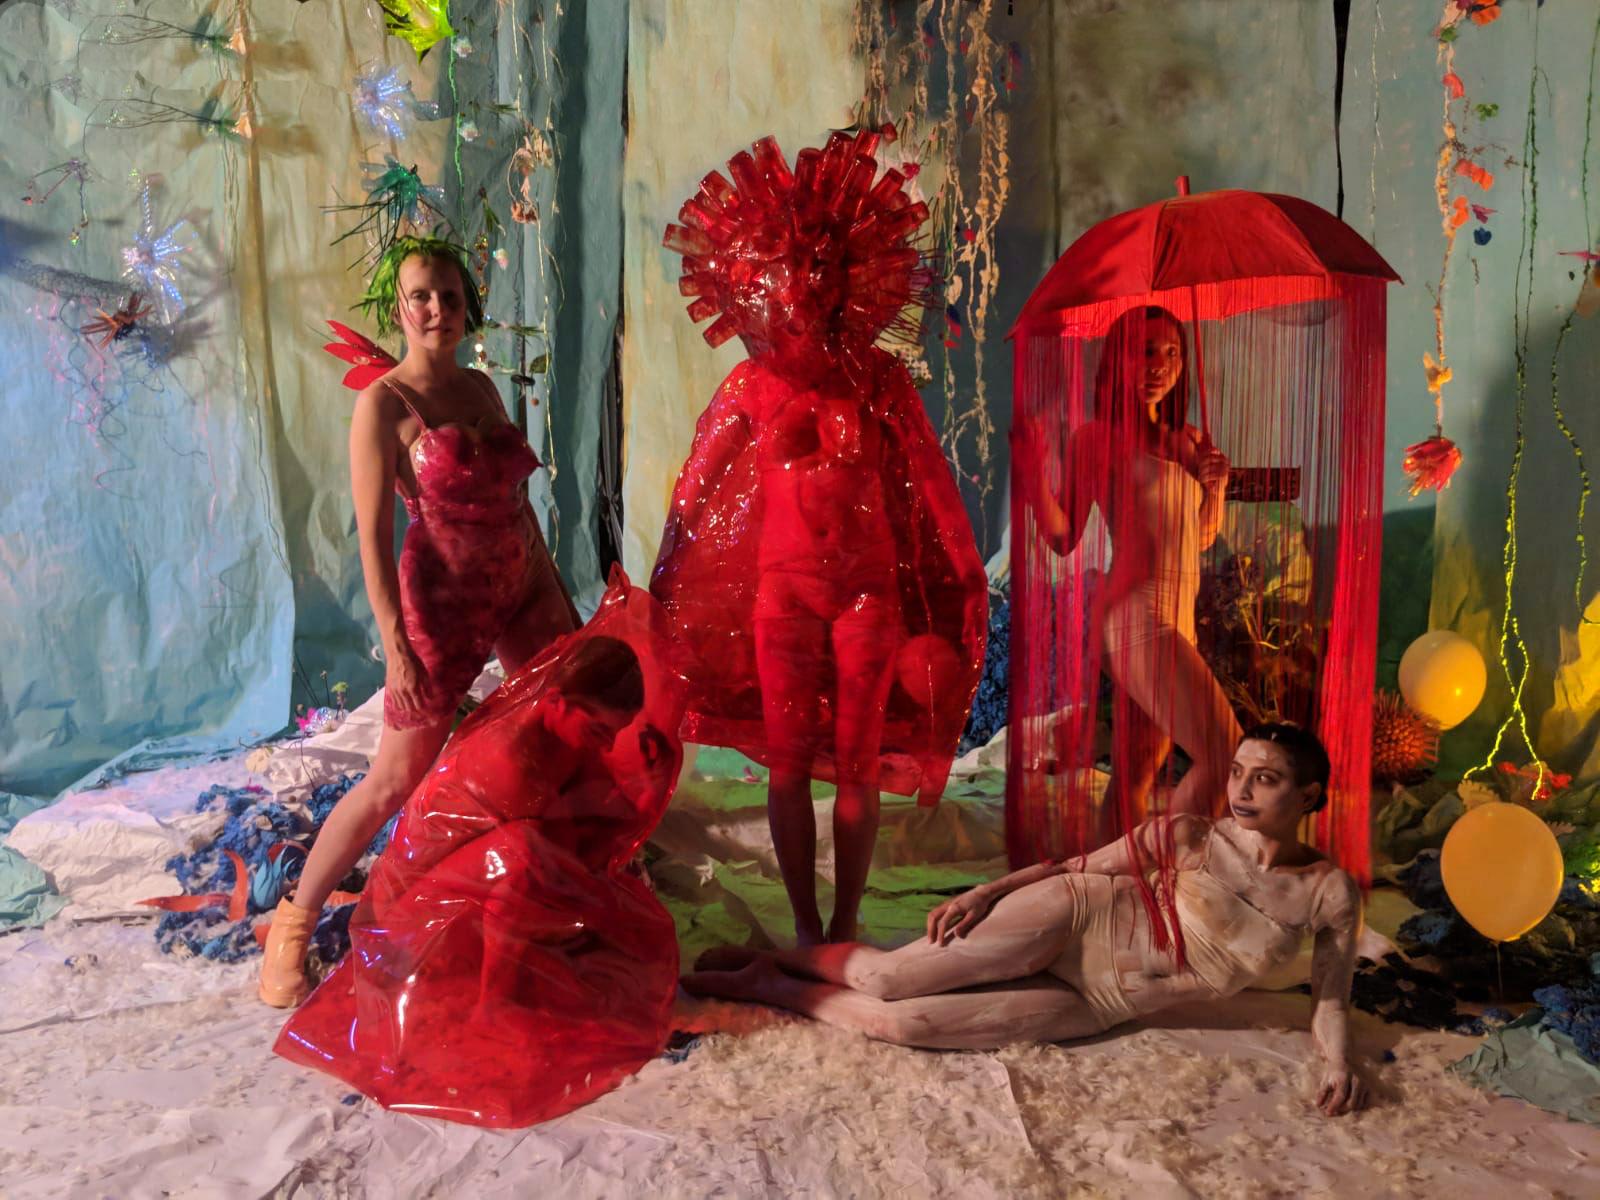 Acud Macht Neu Livia Rita gang of witches berlin Aya Nakagawa Eli Cohen Josephine Auffray Ali Heffetz Siobhan'ocallaghan set